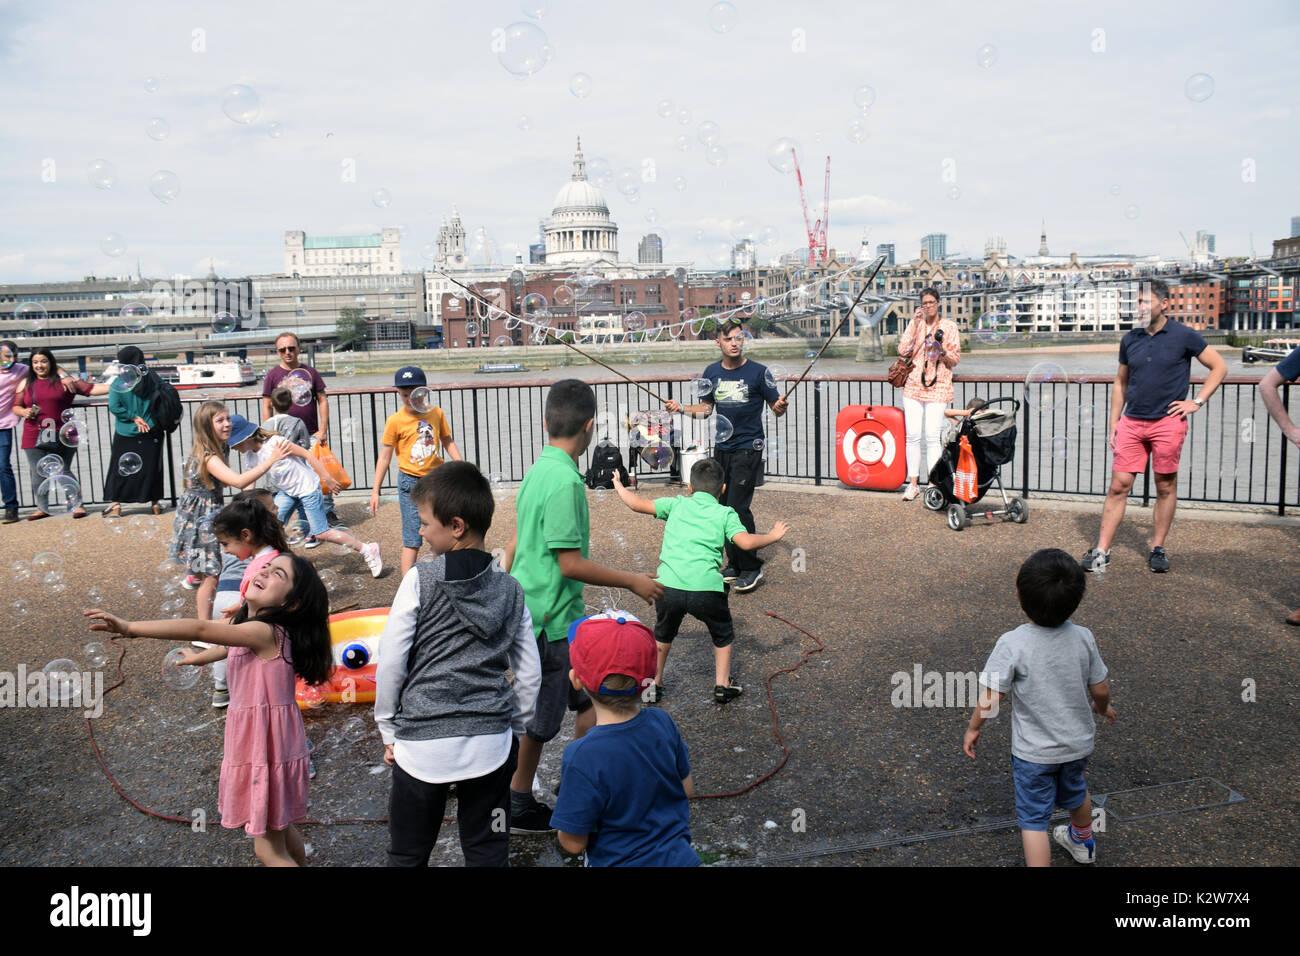 Bubbles entertainer, South Bank, London UK - Stock Image